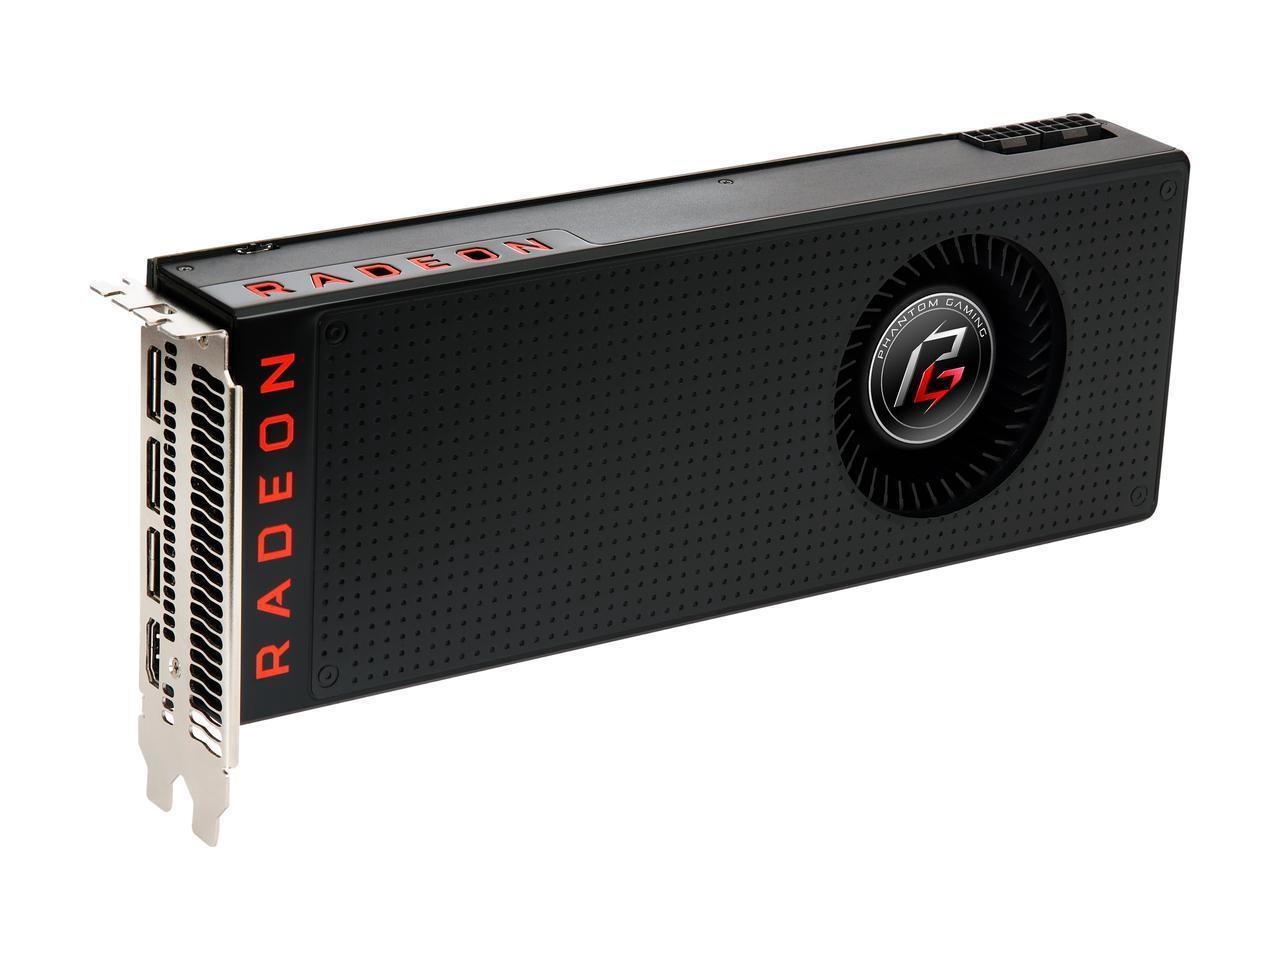 ASRock Phantom Gaming X Radeon RX VEGA 56 8GB Video Card + 2 AMD